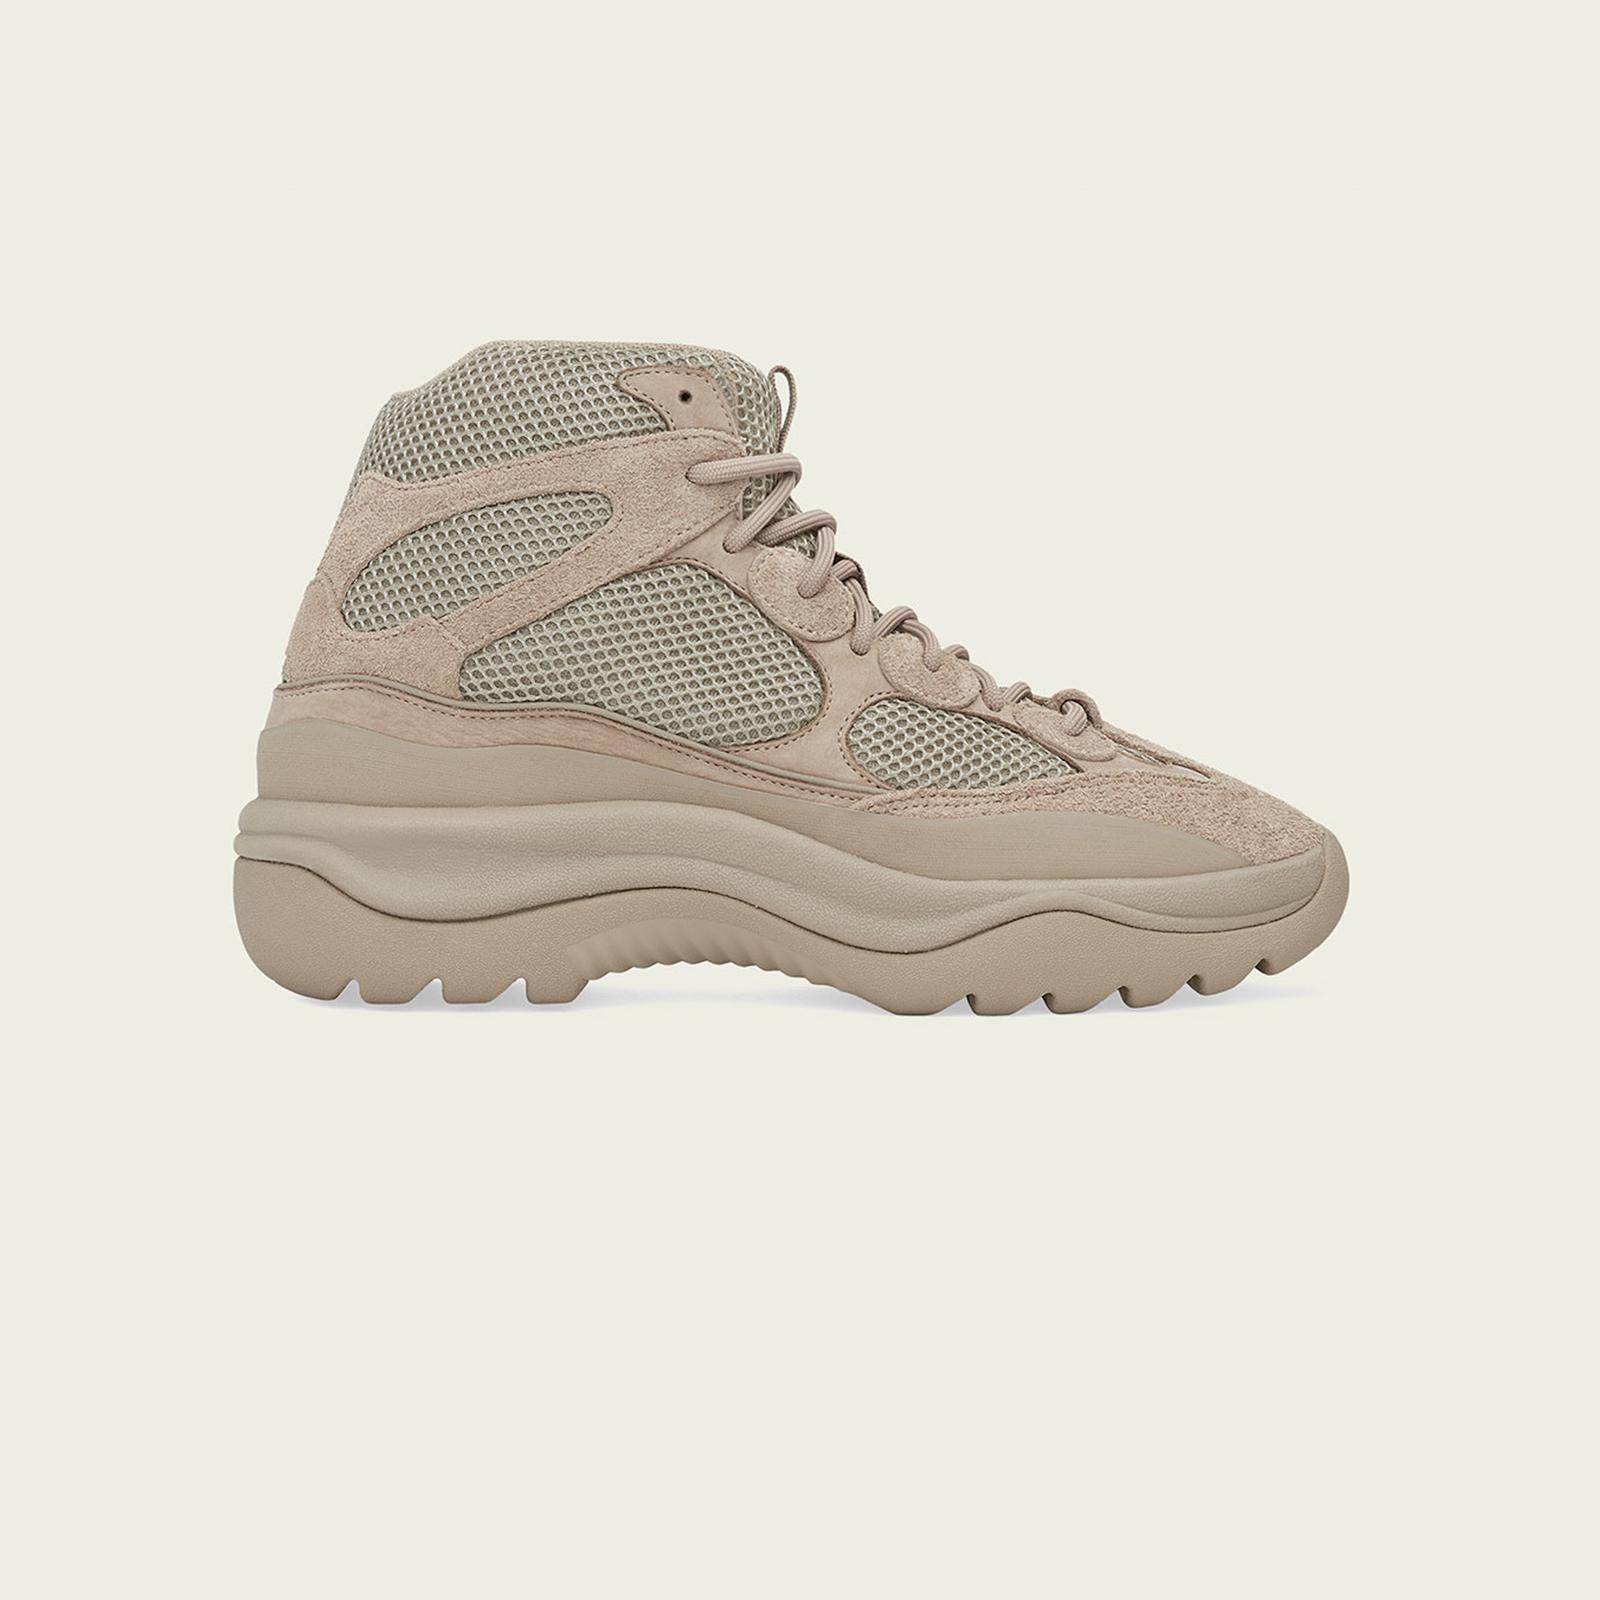 0e33dbc04b6 adidas Yeezy Boots - Eg6462 - Sneakersnstuff